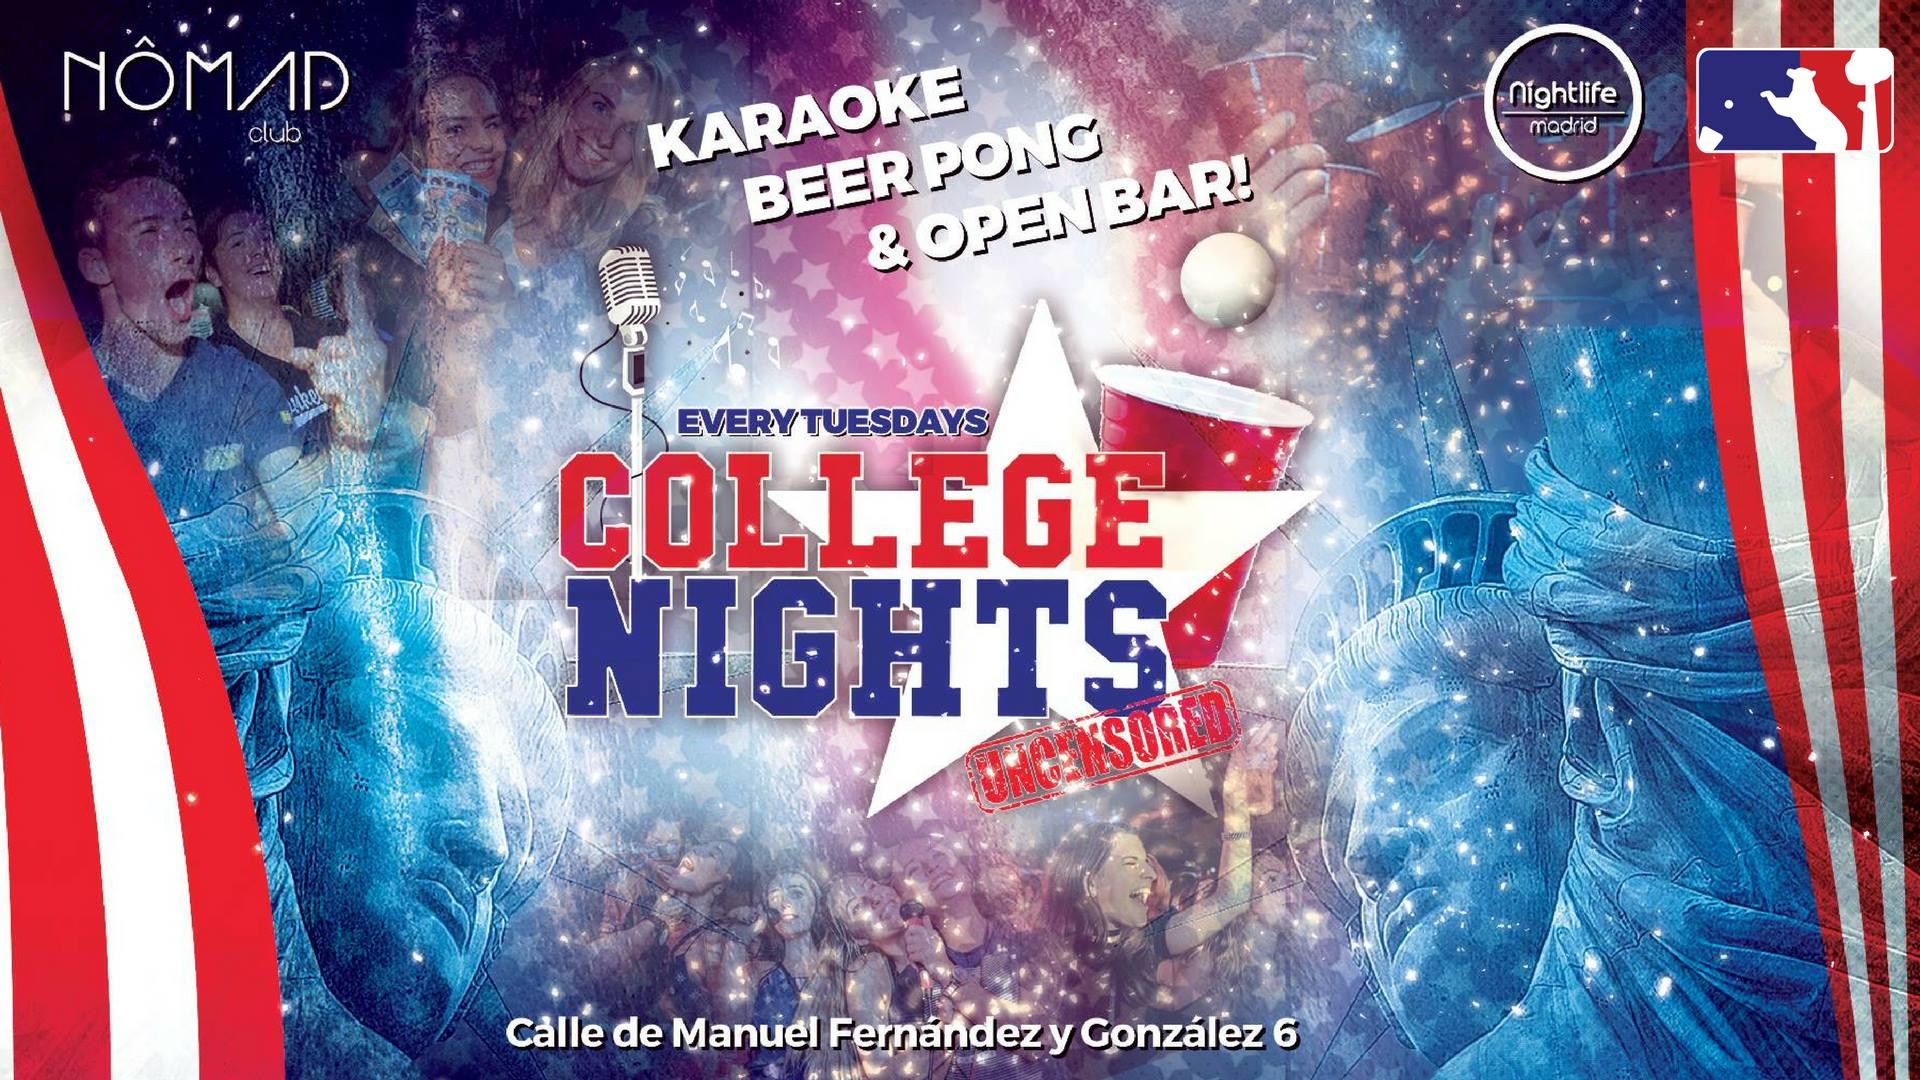 College Nights - Karaoke, Beer Pong & Open Bar - Club Nomad club